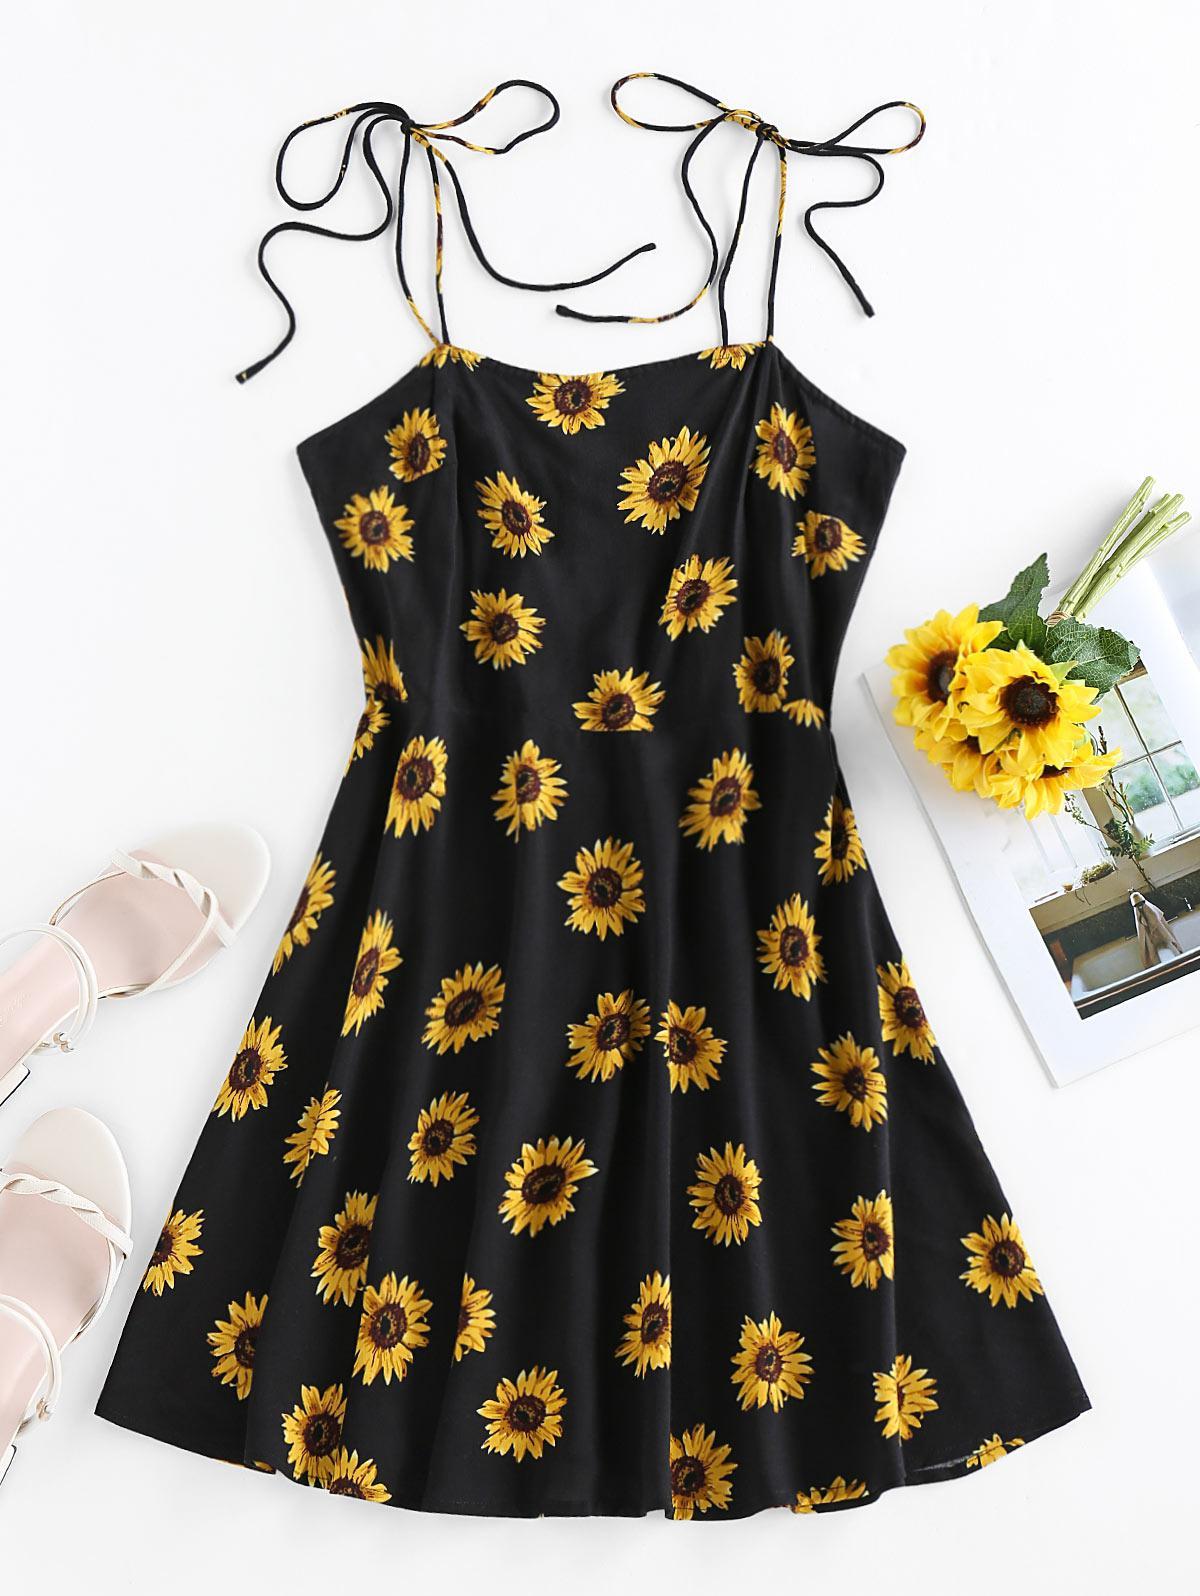 ZAFUL Sunflower Print Tie Shoulder Backless Dress